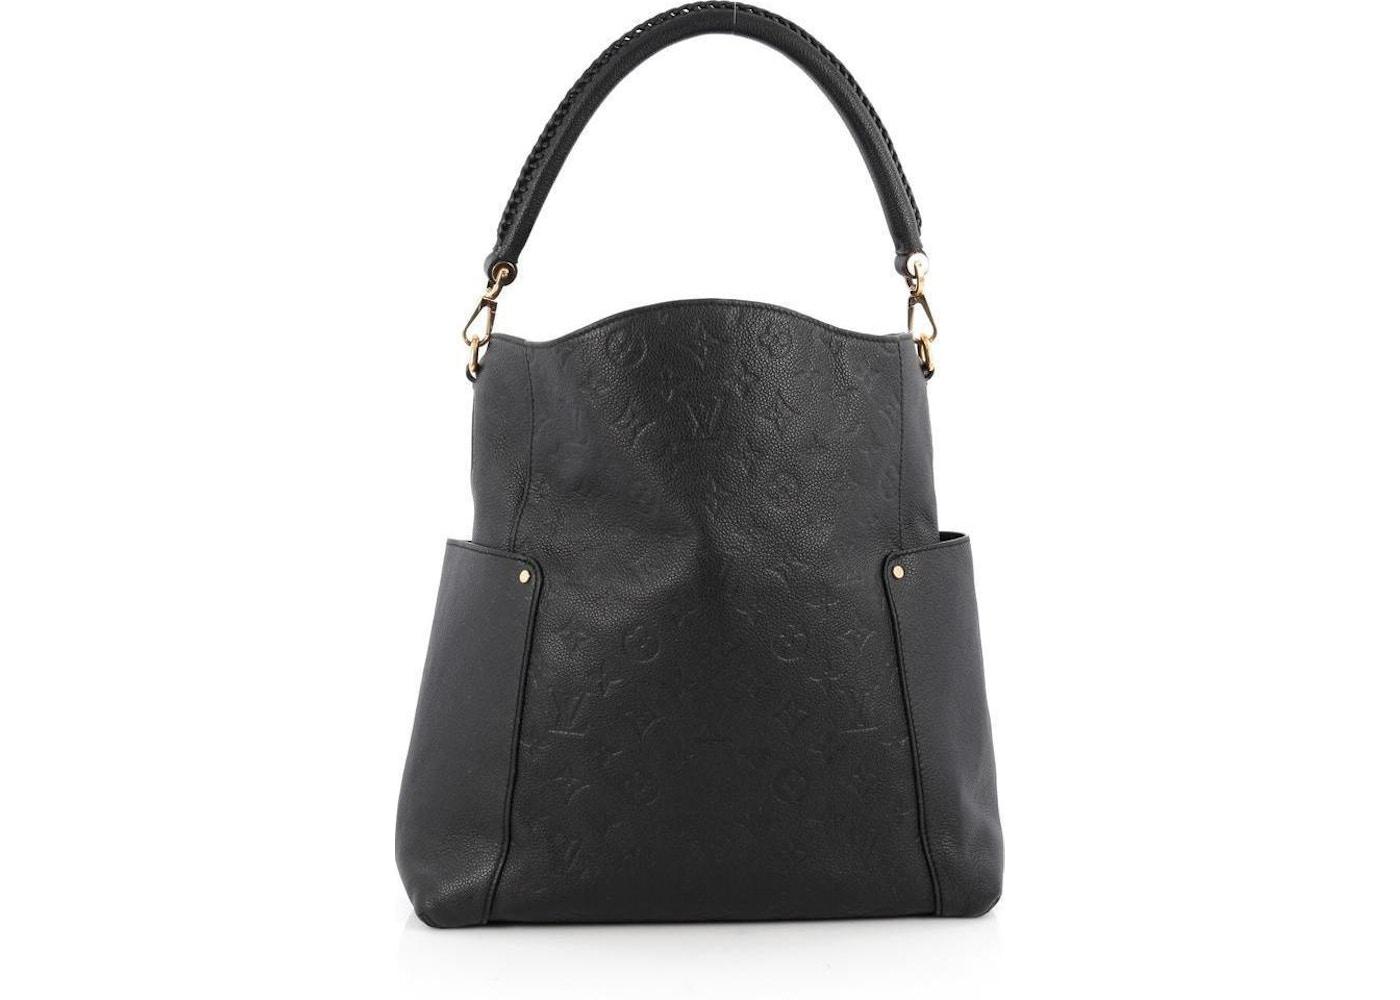 6395338a1 Sell. or Ask. View All Bids. Louis Vuitton Bagatelle Monogram Empreinte ...